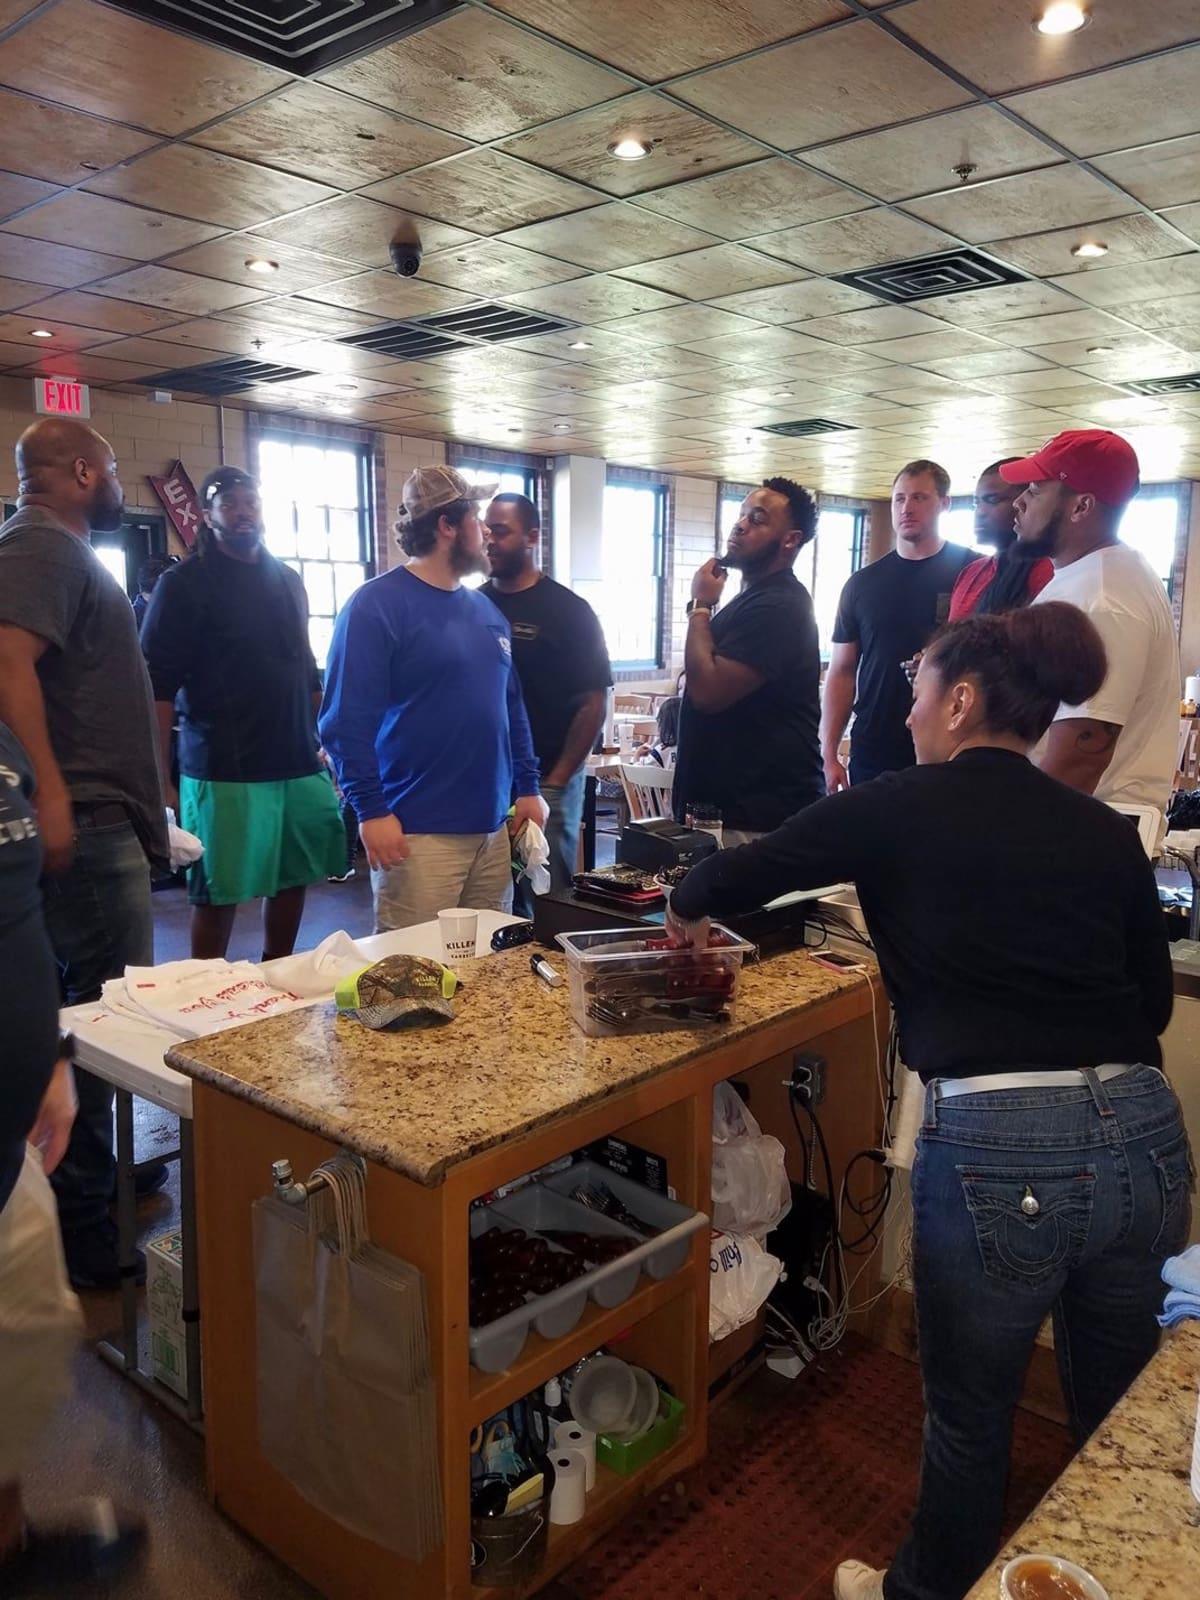 New England Patriots Killen's Barbecue